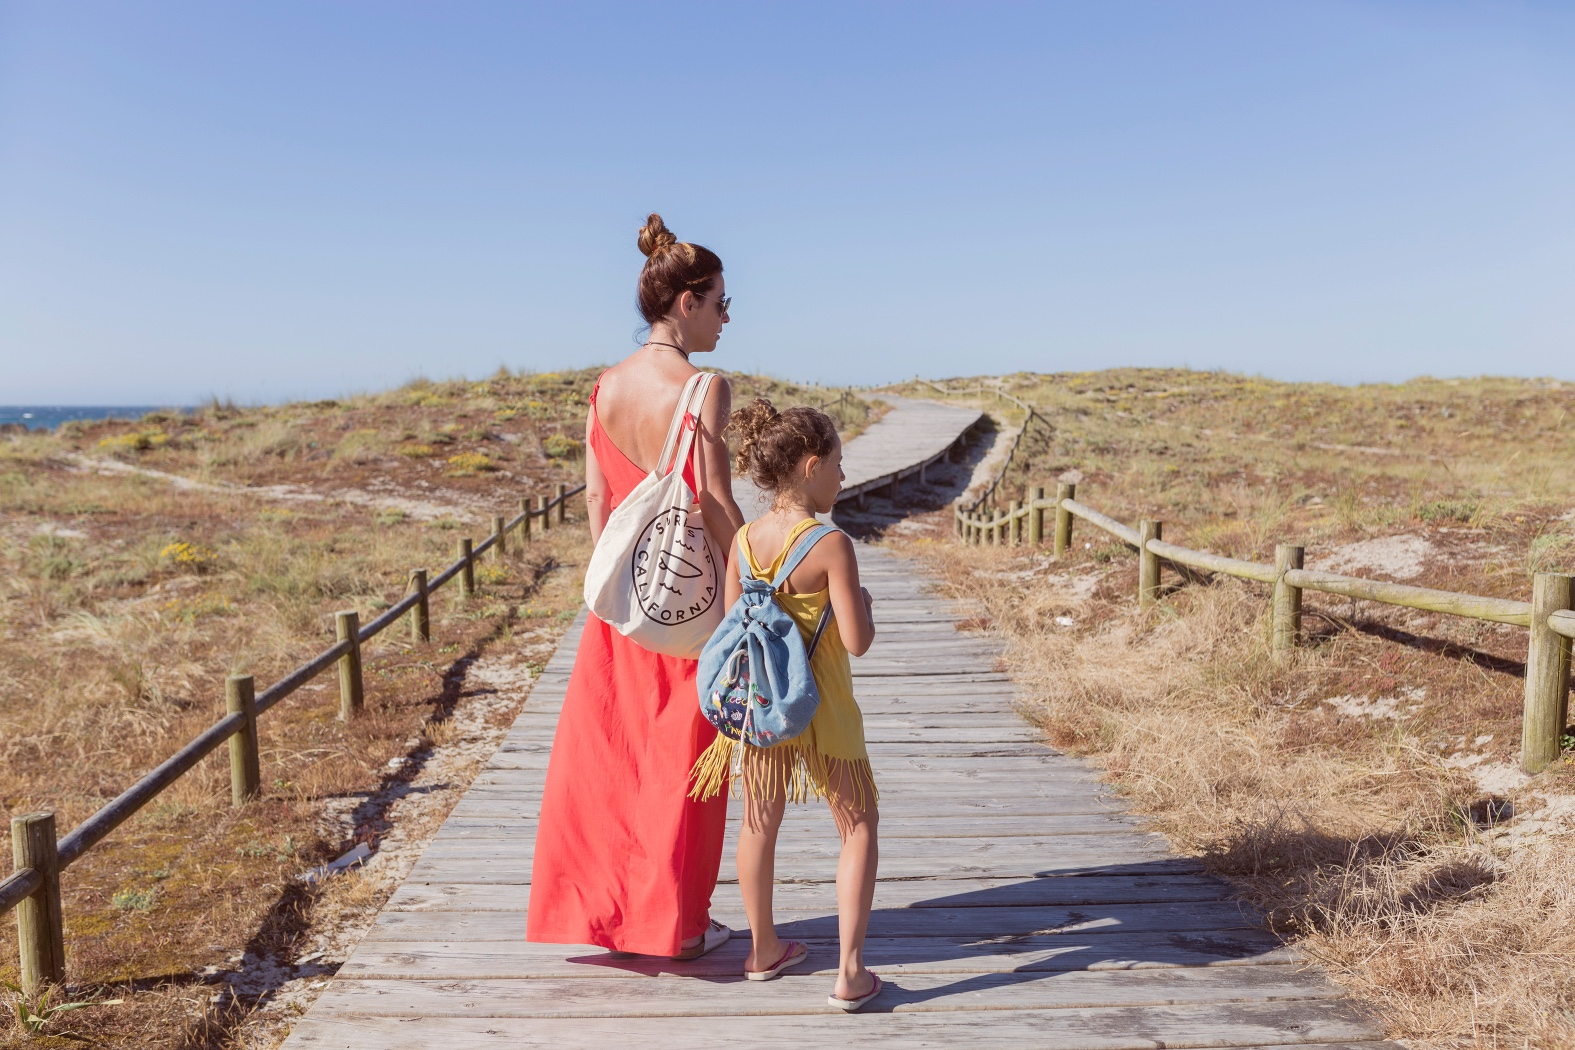 playa-barrañan-arteixo -barrañán -coruña - descalzaporelparque - jimena and me - madre e hija - playa - pull and bear - rayban -rojo -summer - zara